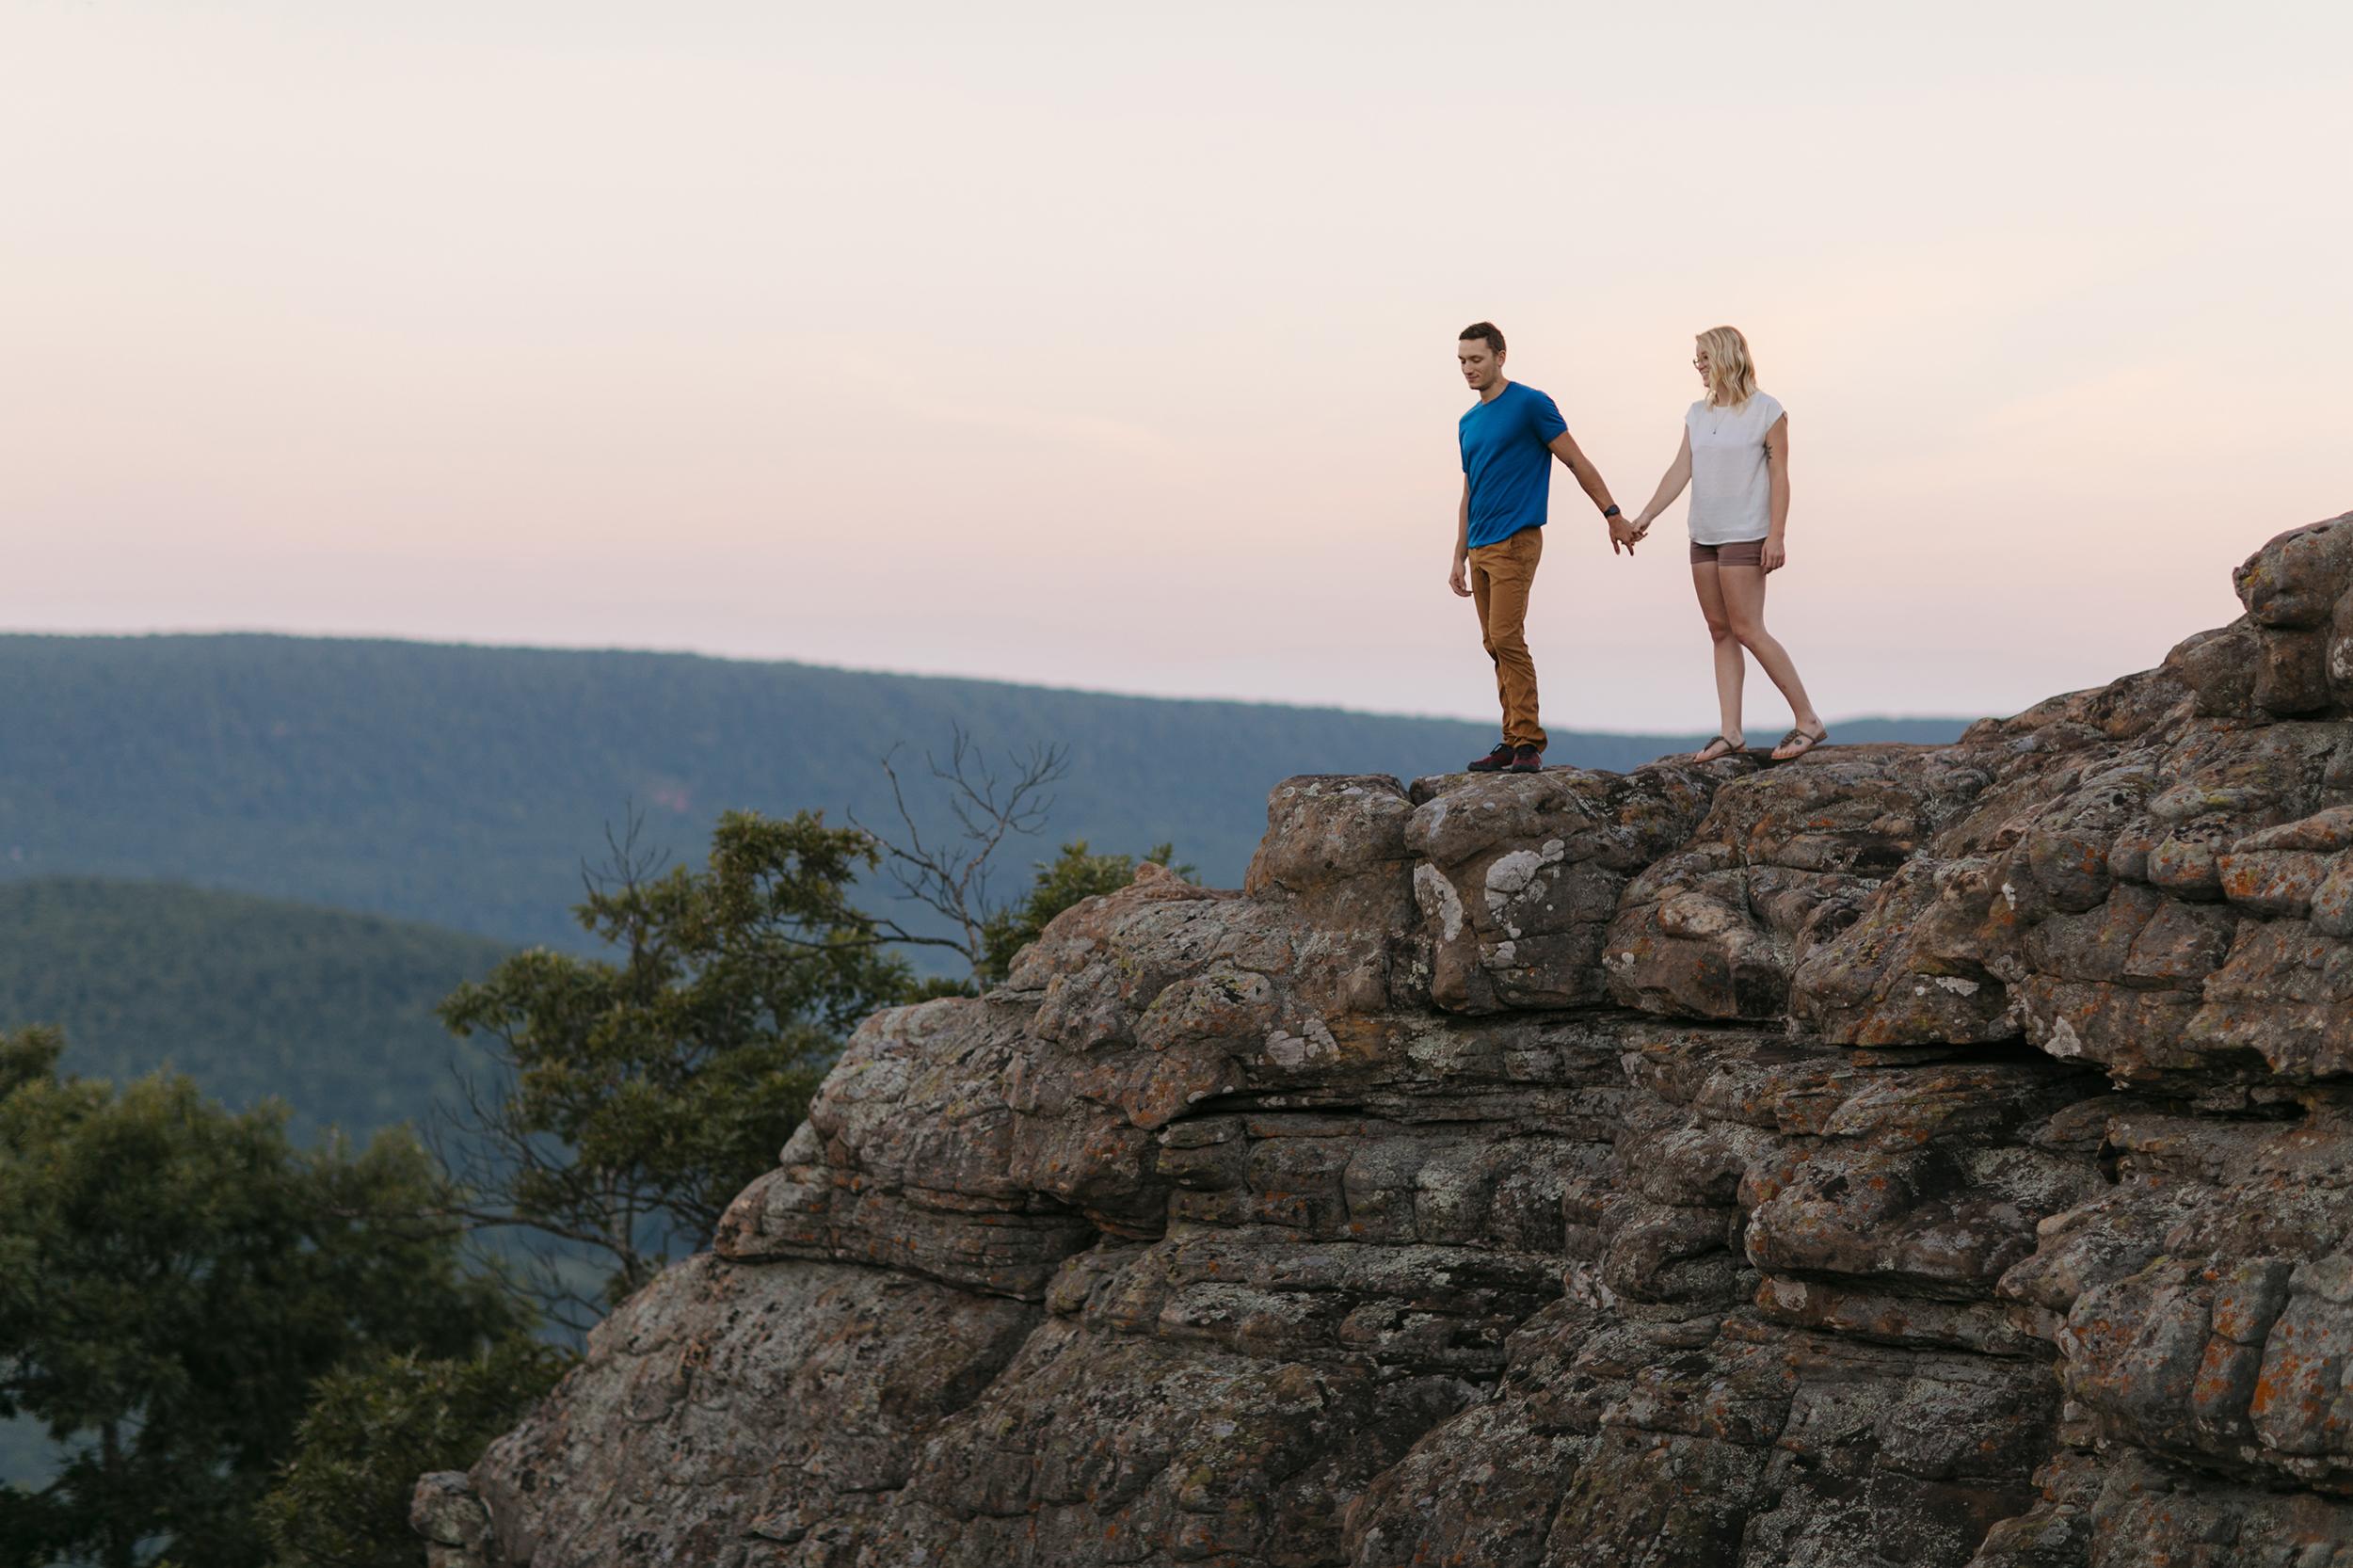 Buffalo-River-Arkansas-Sams-Throne-Adventure-Engagement-Photographer4.JPG